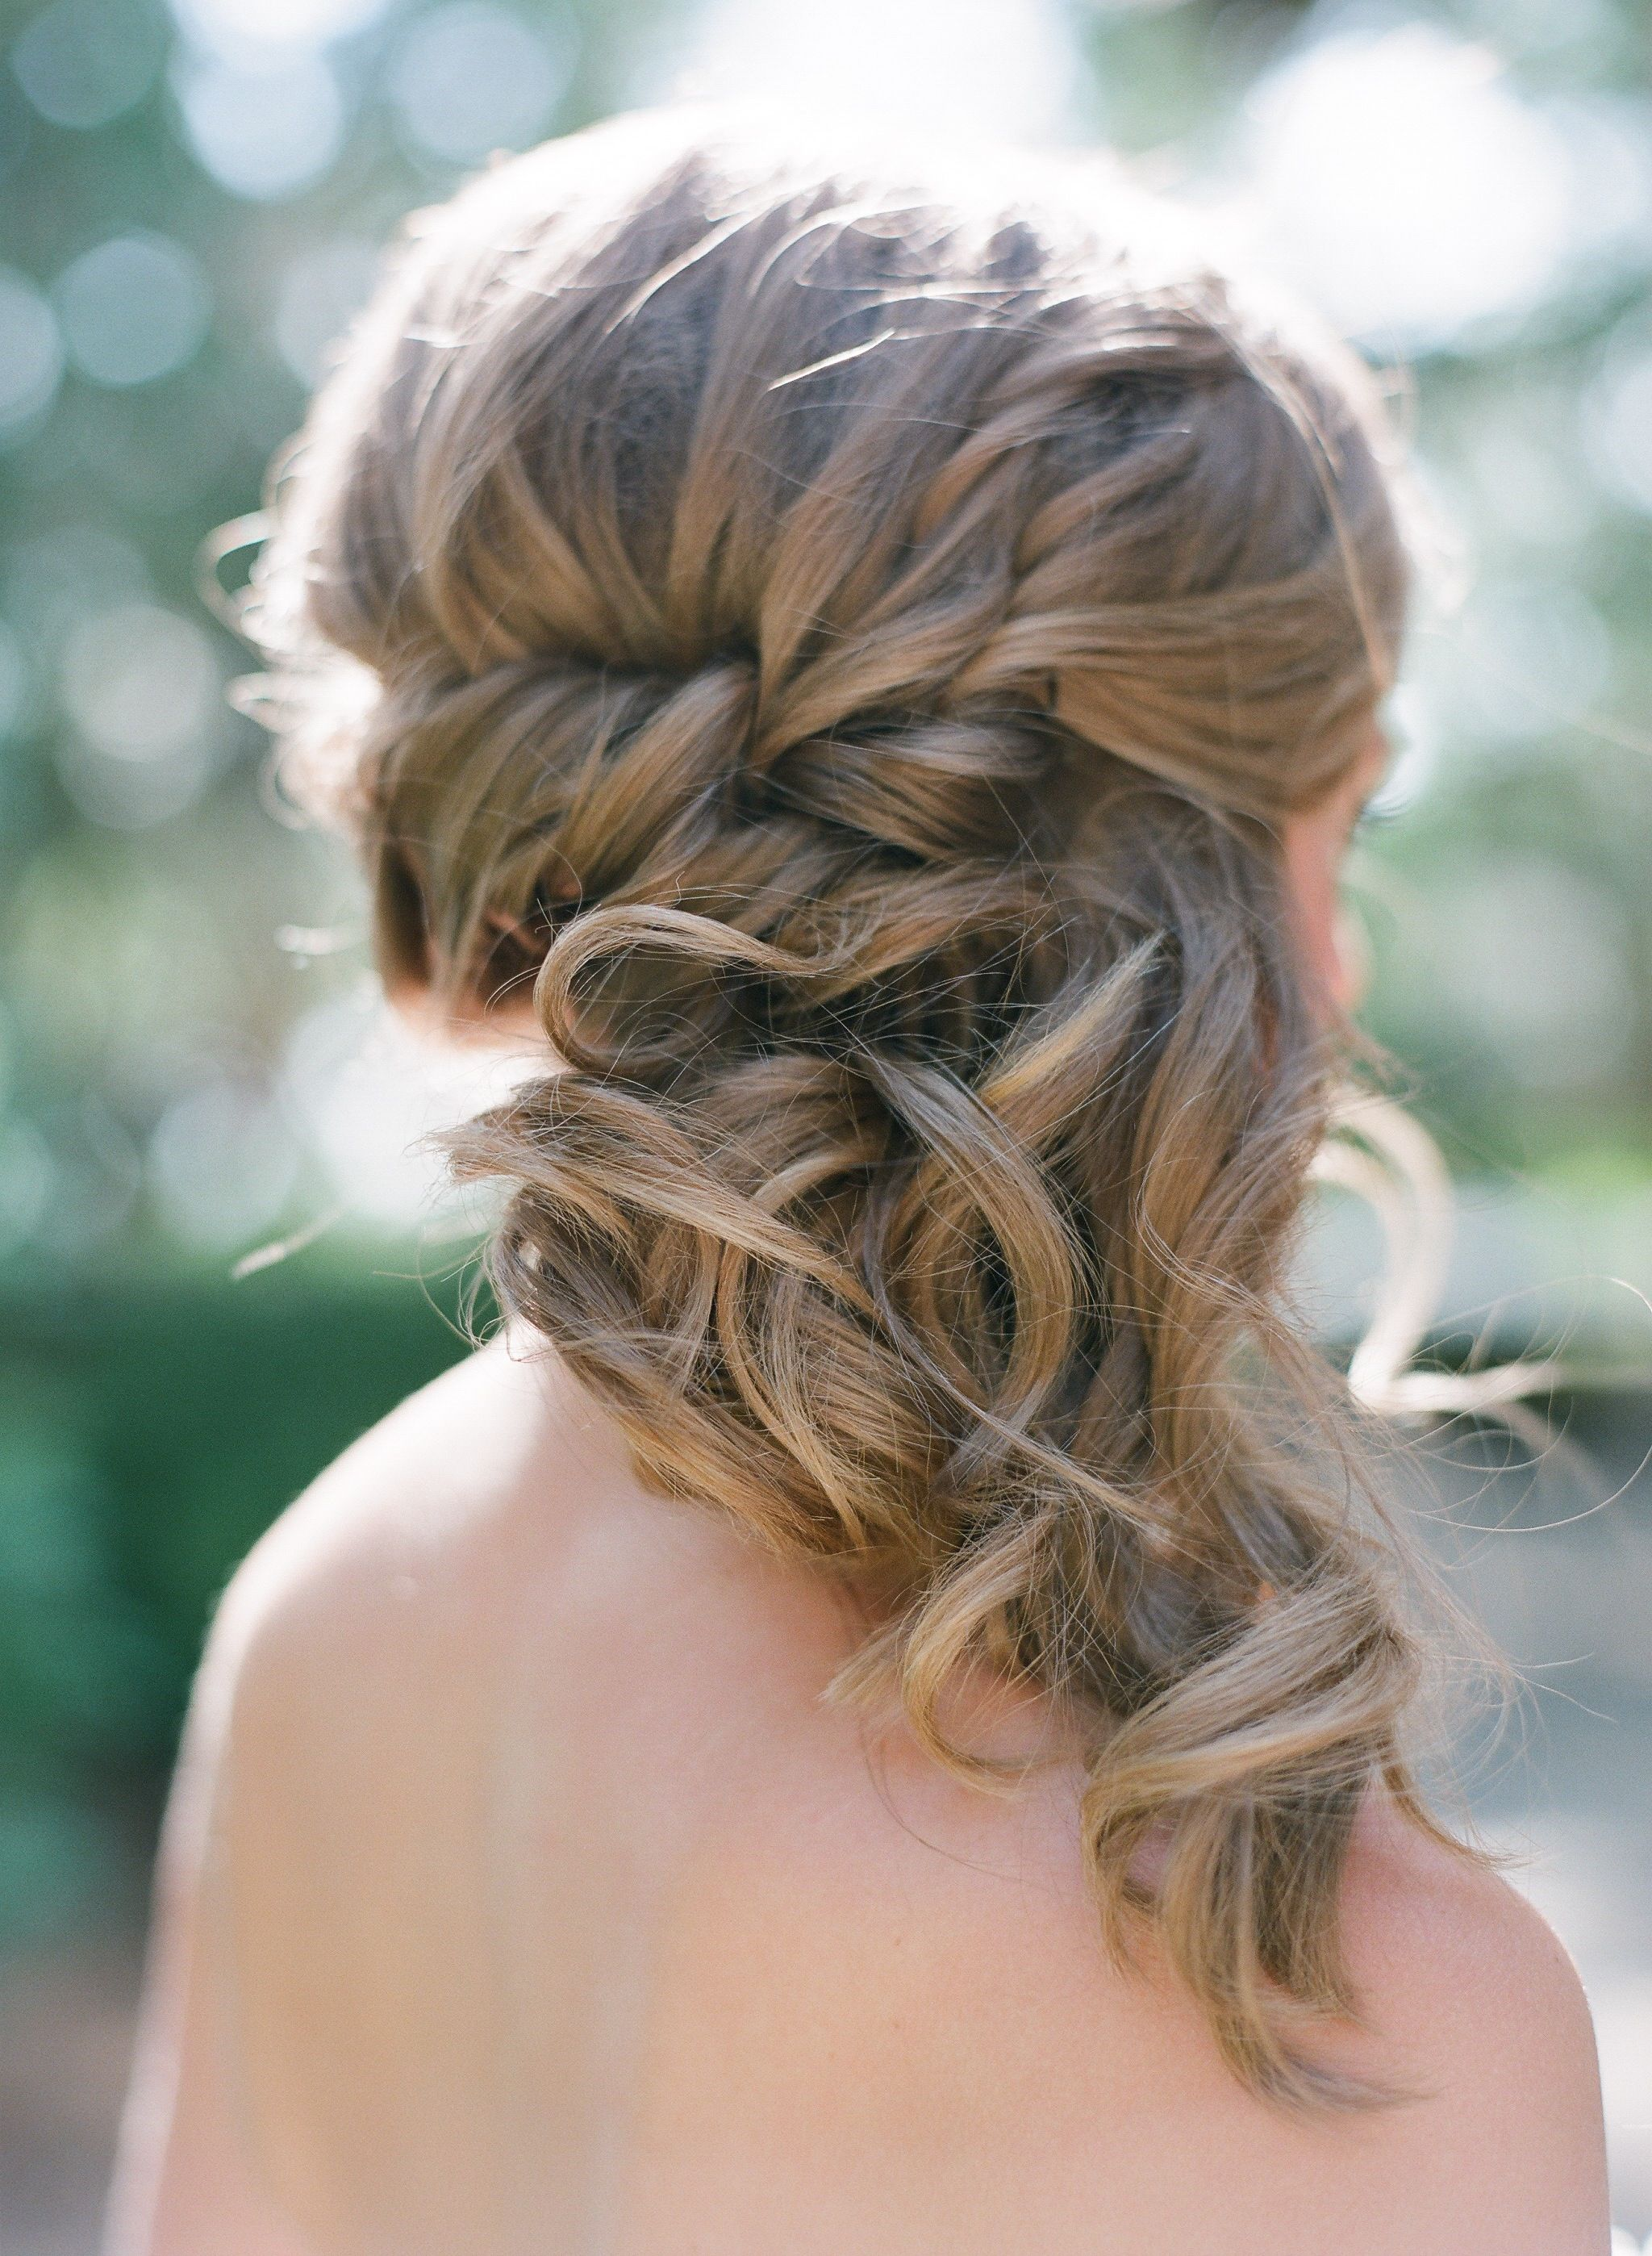 side pony bridesmaid style updo wedding | Side hairstyles, Wedding hair side, Side swept hairstyles